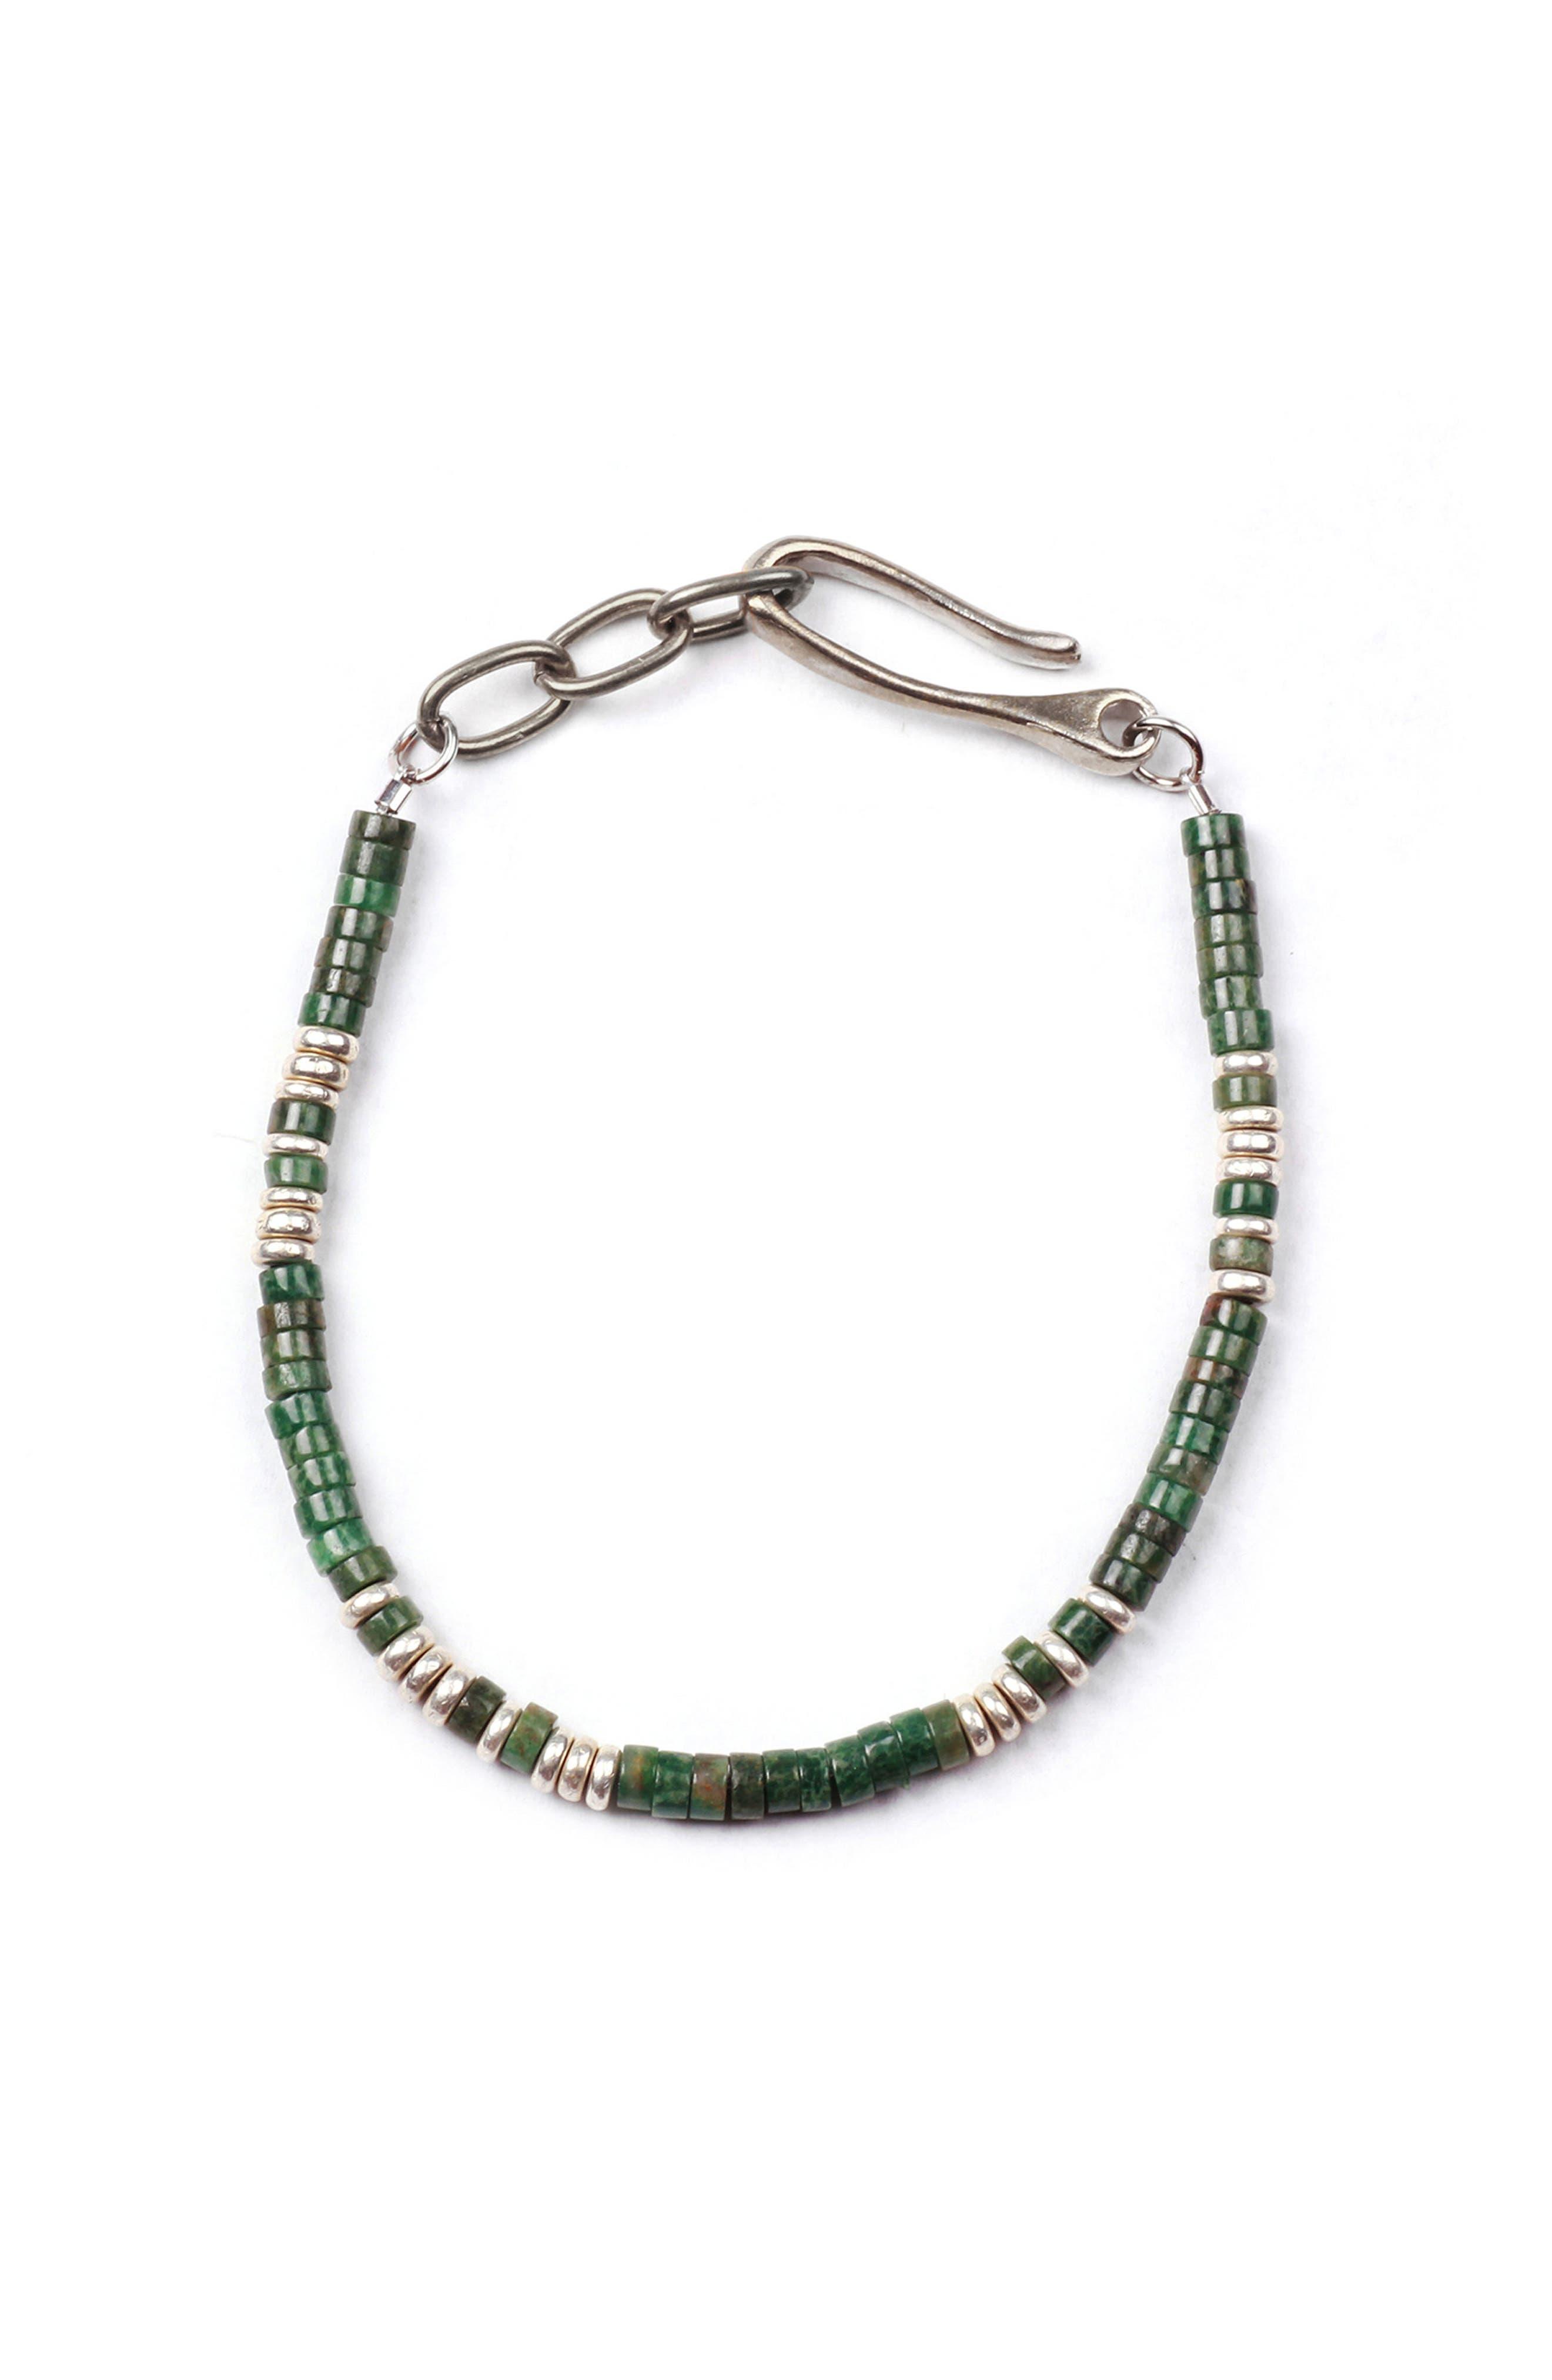 Luck Morse Bracelet,                         Main,                         color, Silver / Turquoise